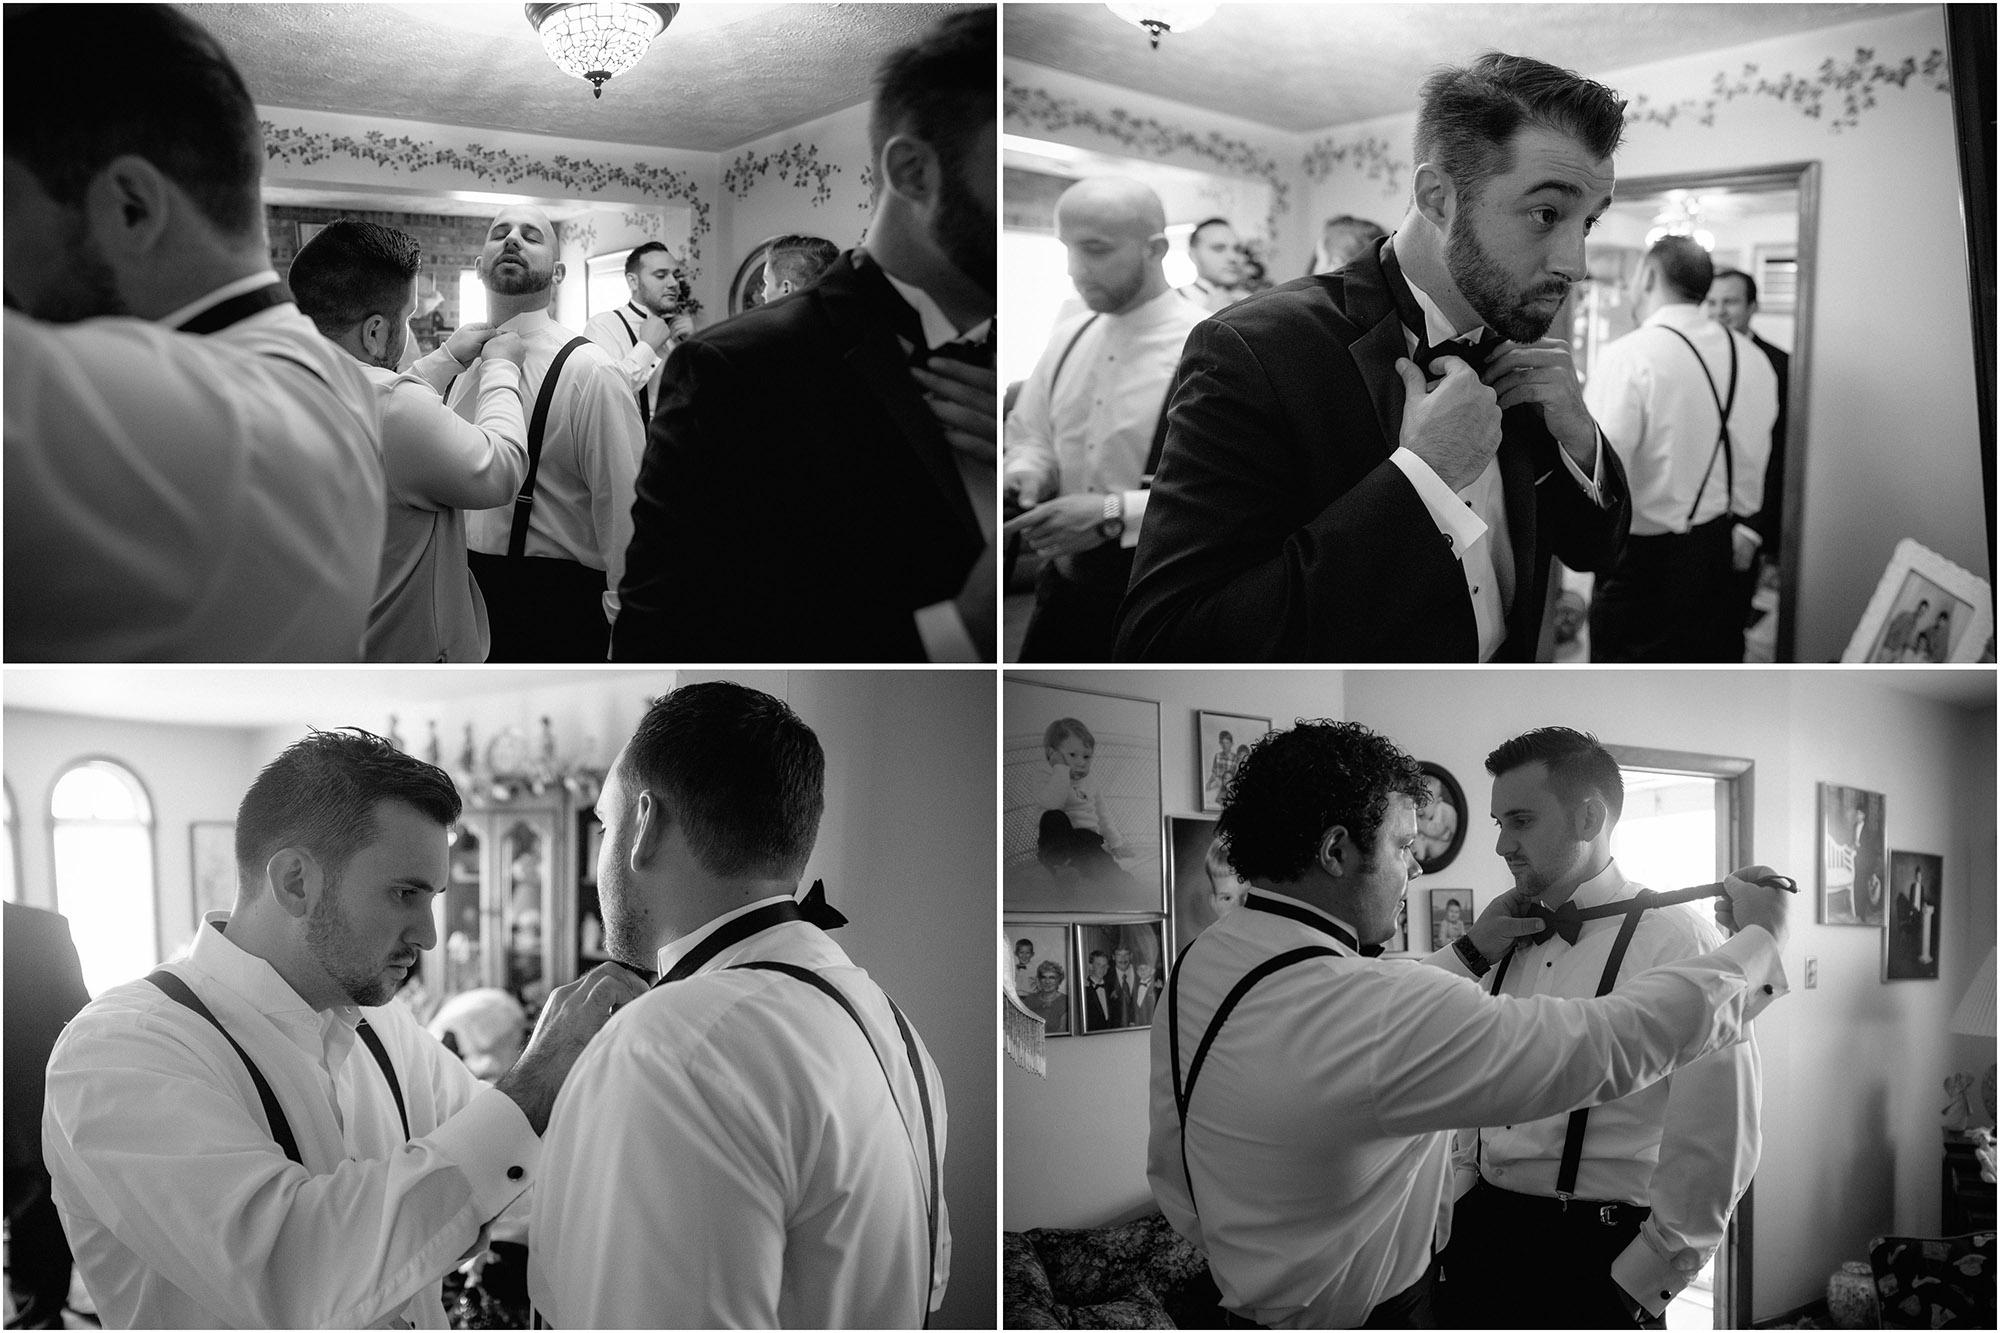 mia-josh-scranton-wedding-photography-004